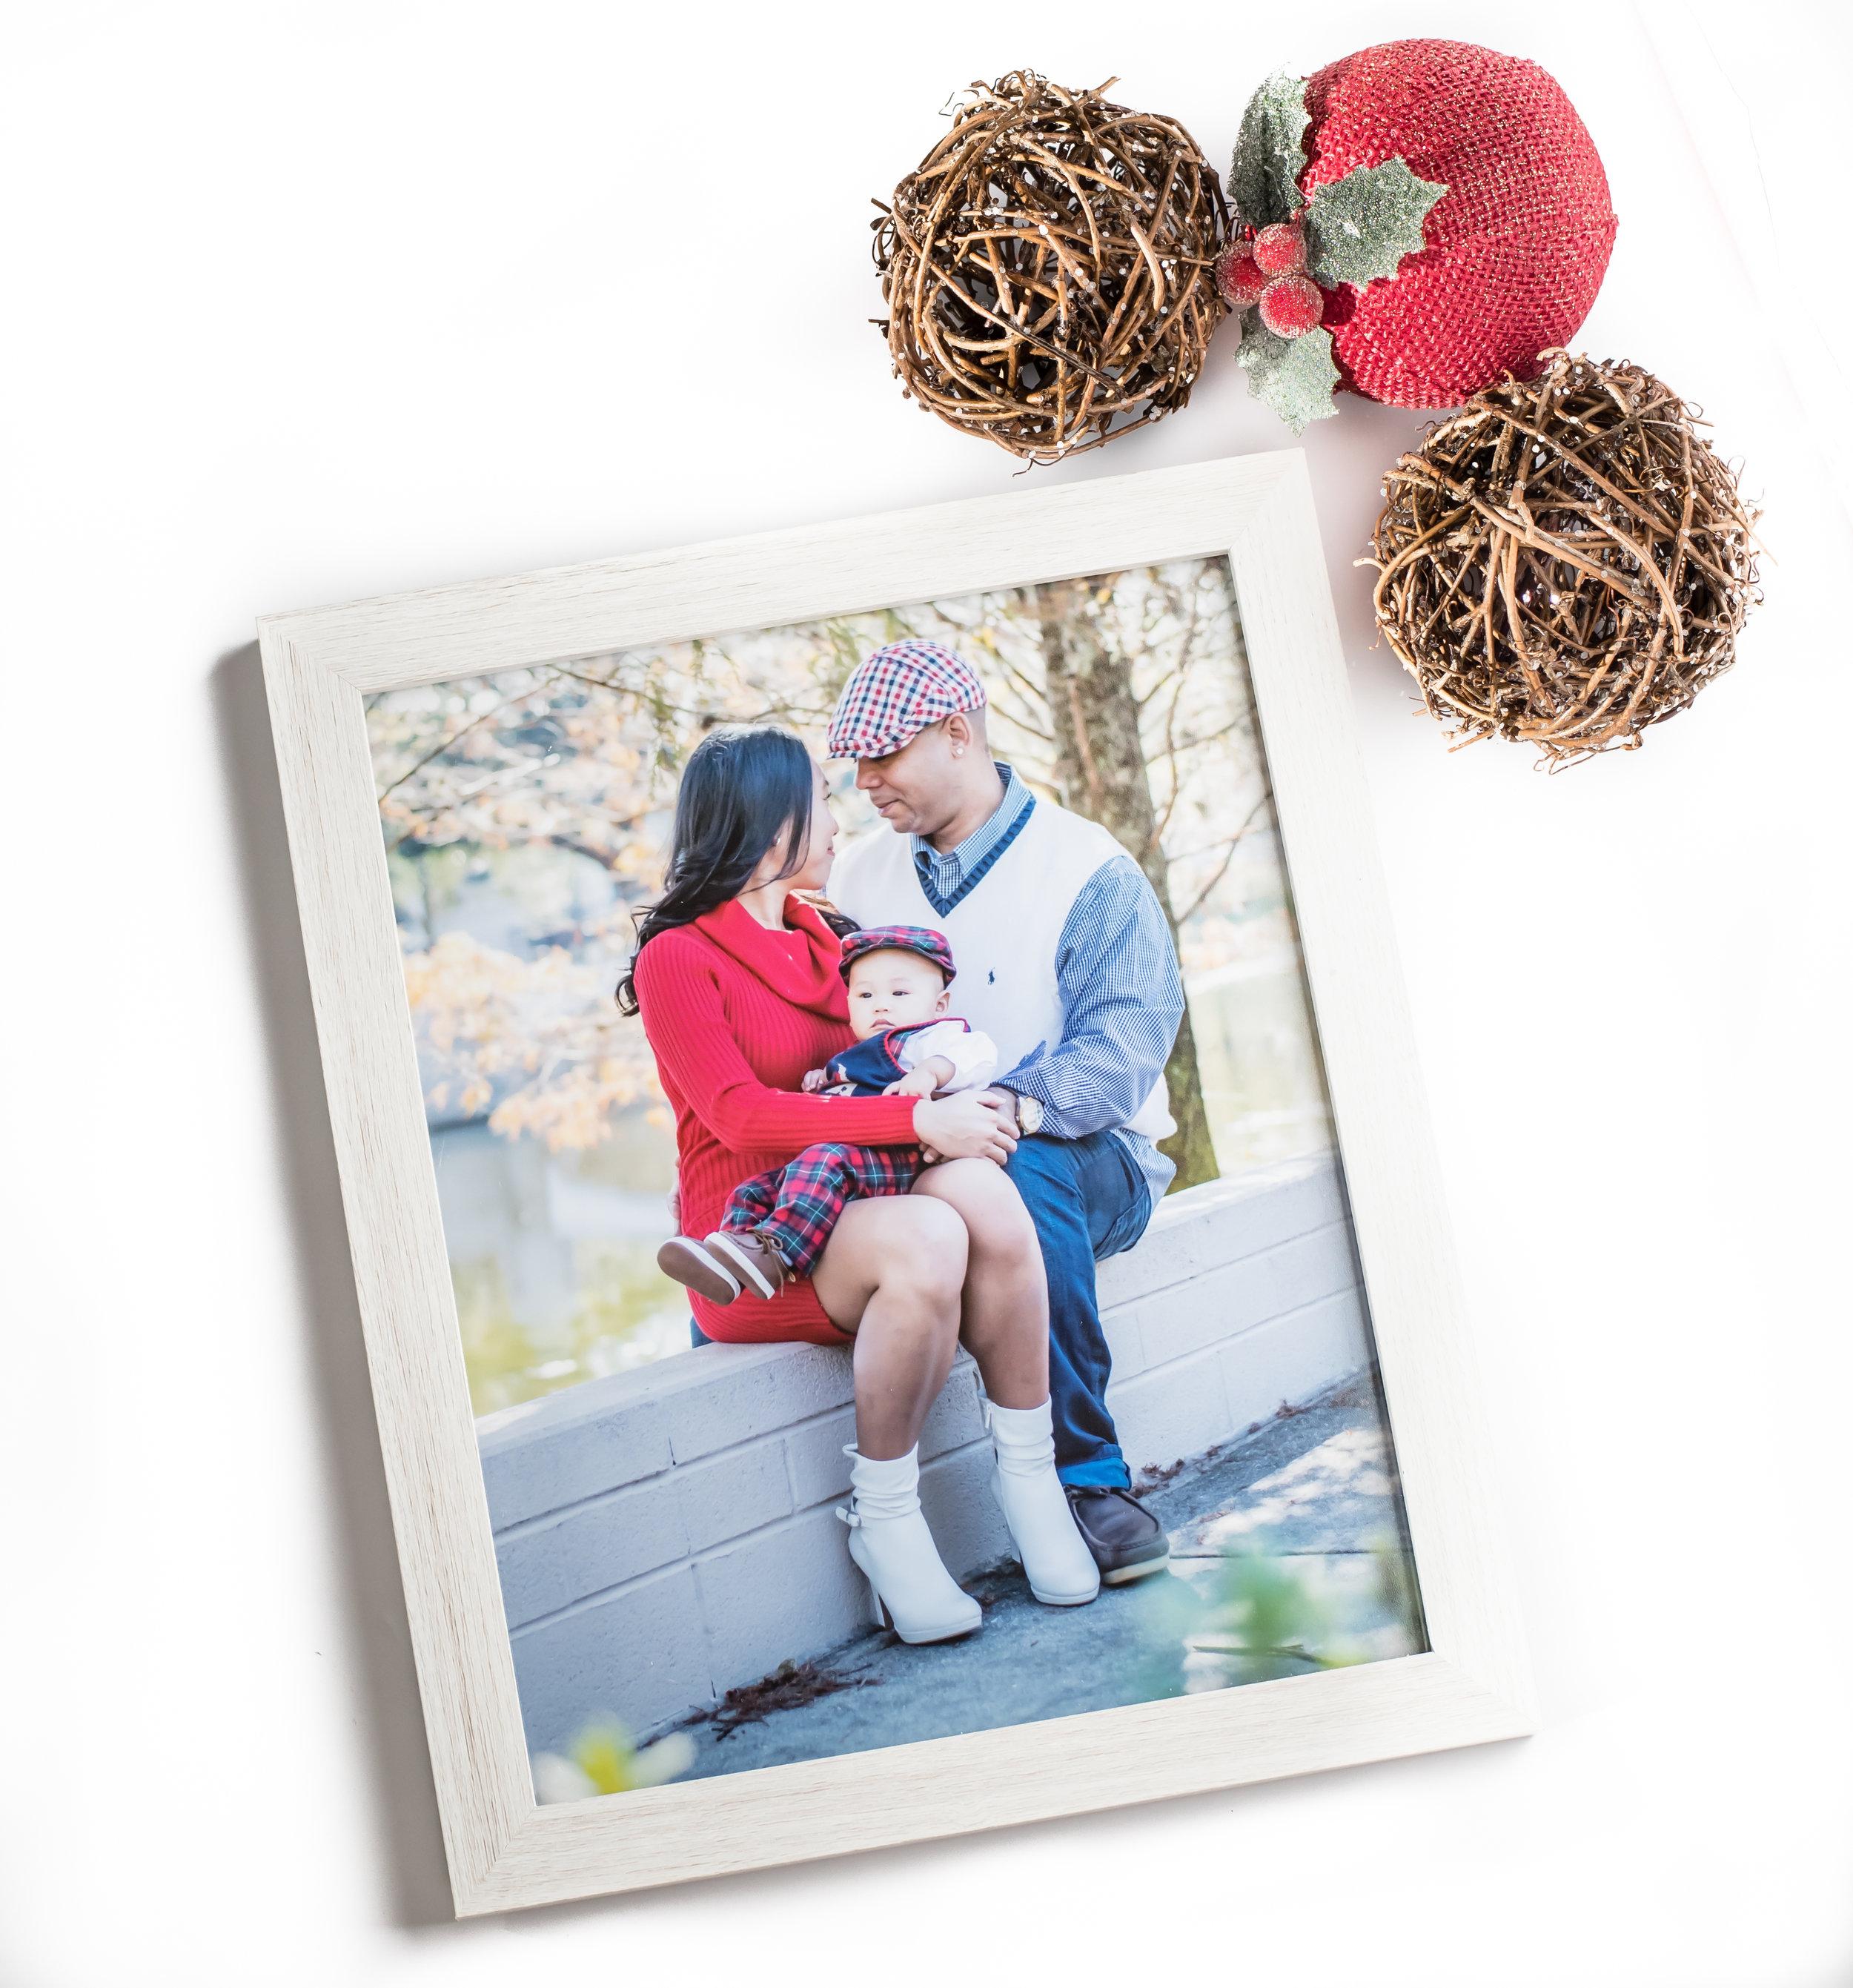 best-christmas-gifts-orlando-lifestyle-blogger-photographer-yanitza-ninett-24-9.jpg